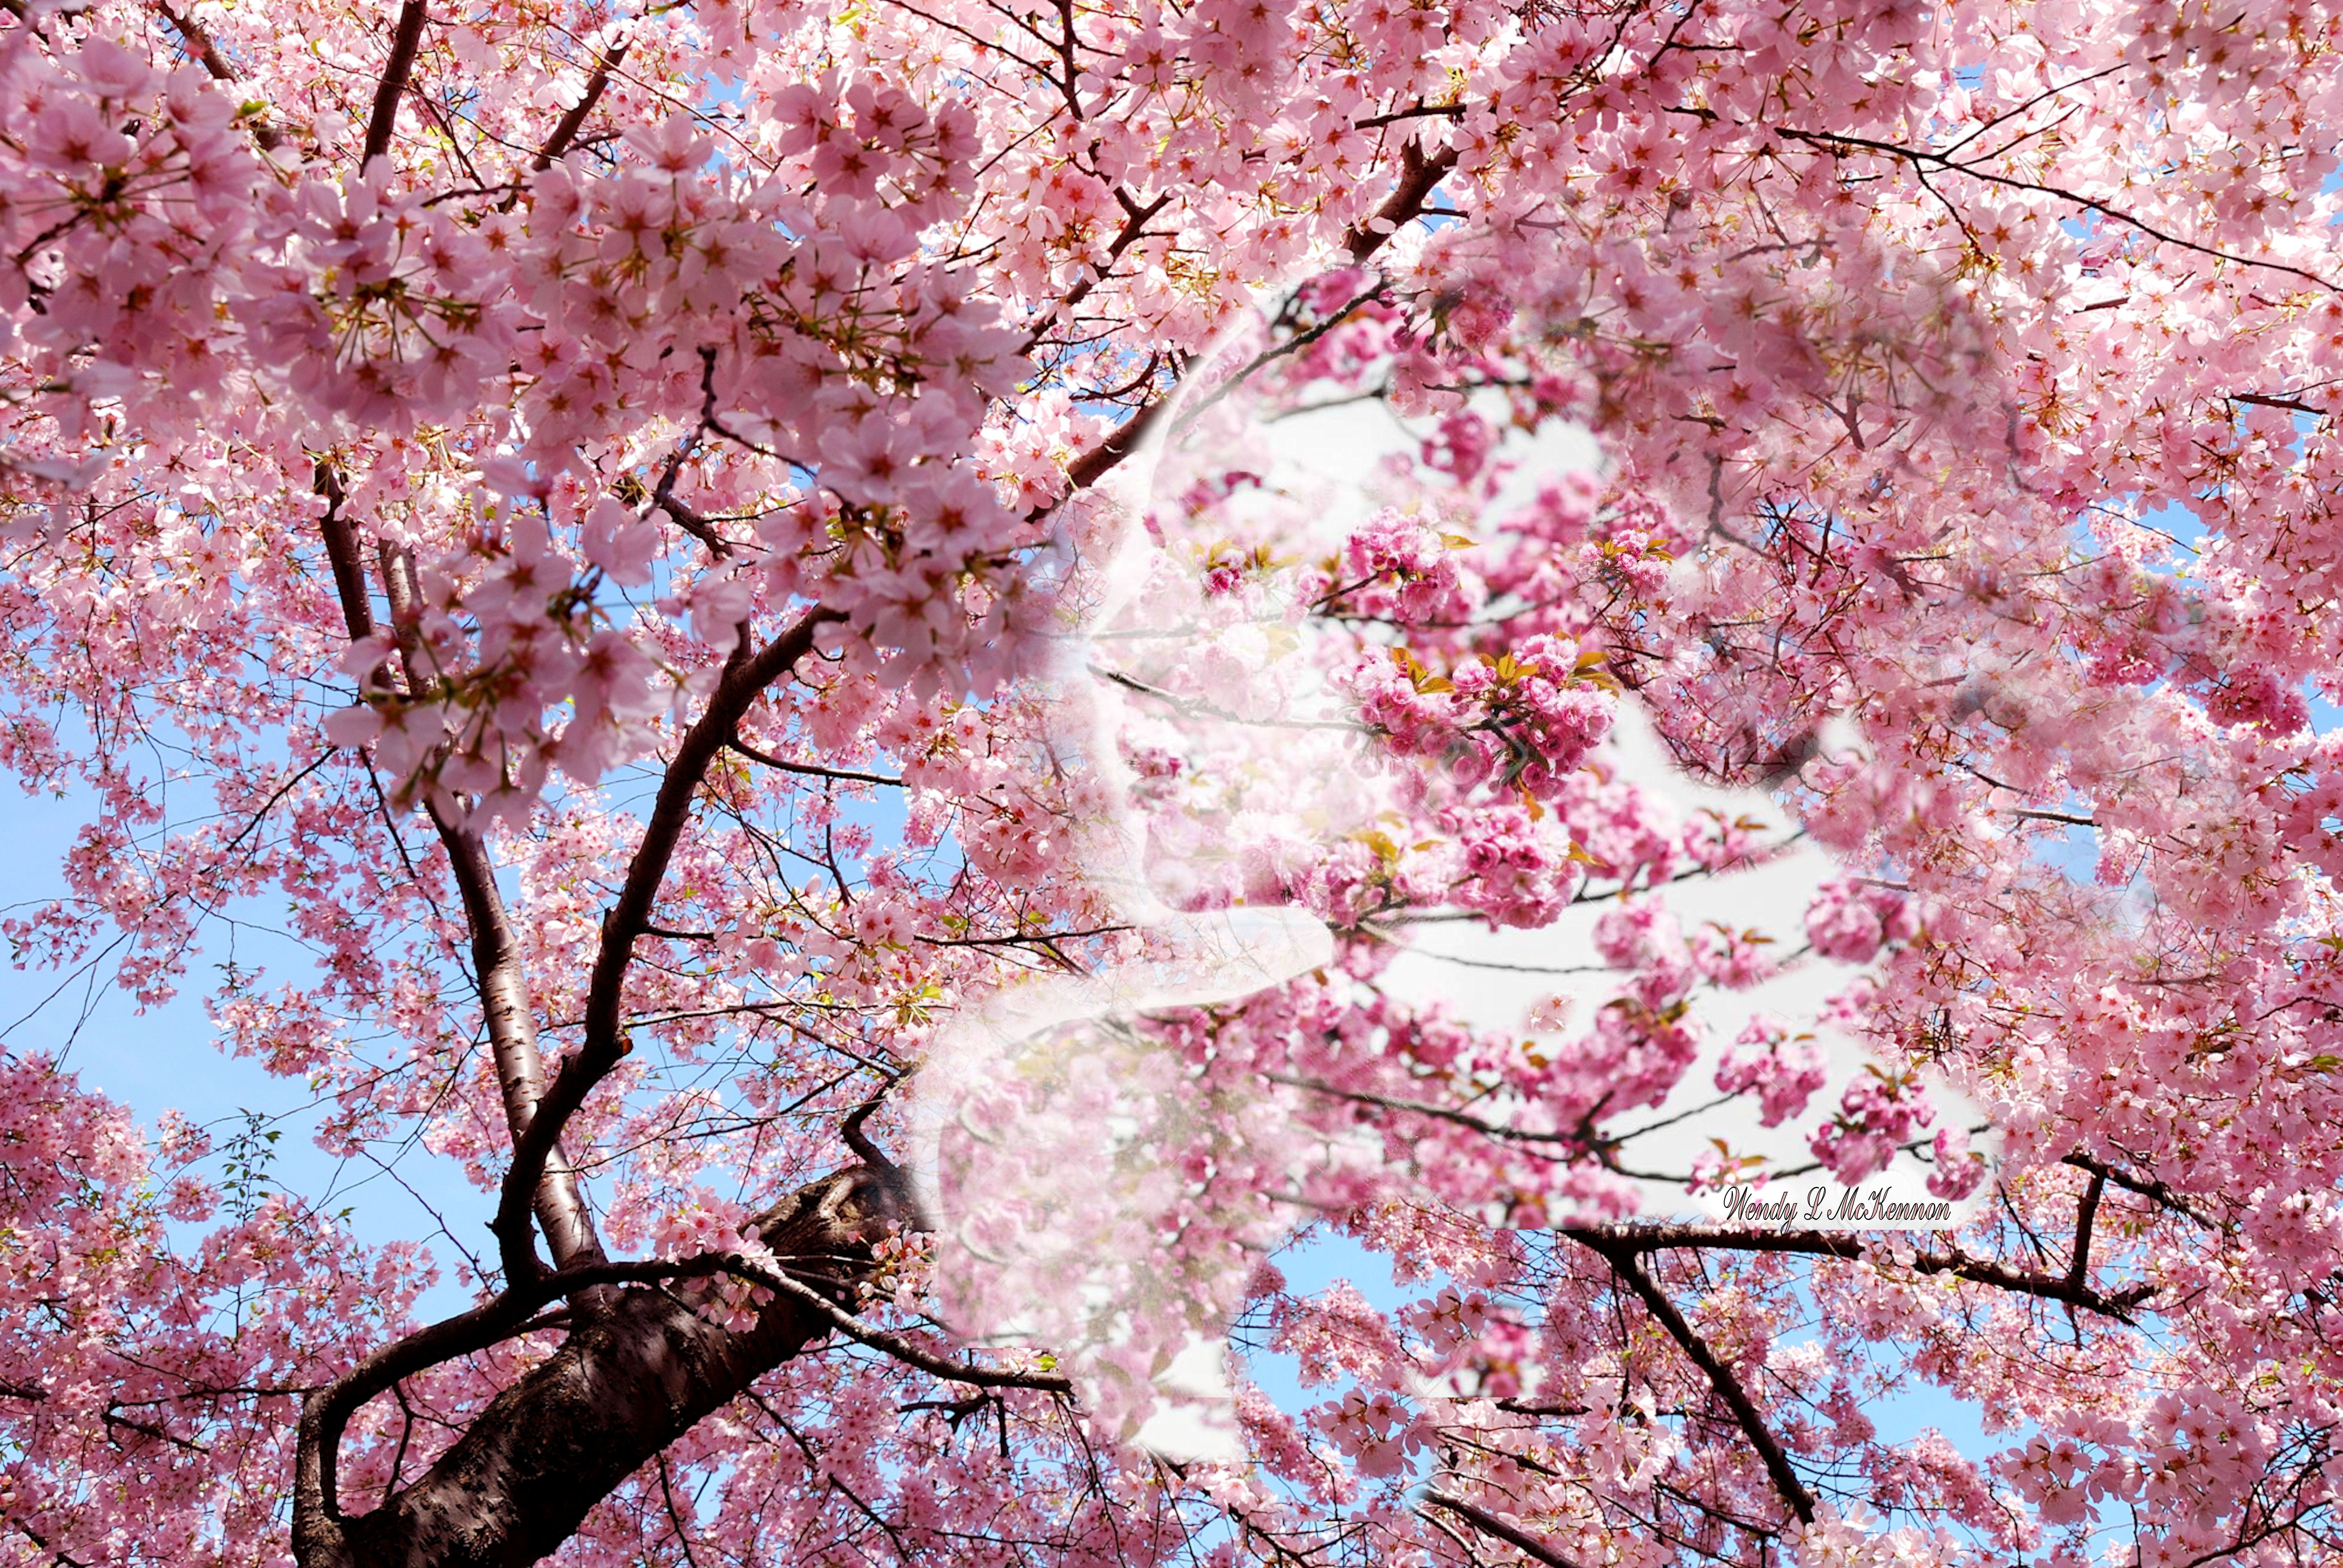 Cherry Blossom Girl Cherry Blossom Background Cherry Blossom Tree Flowering Cherry Tree